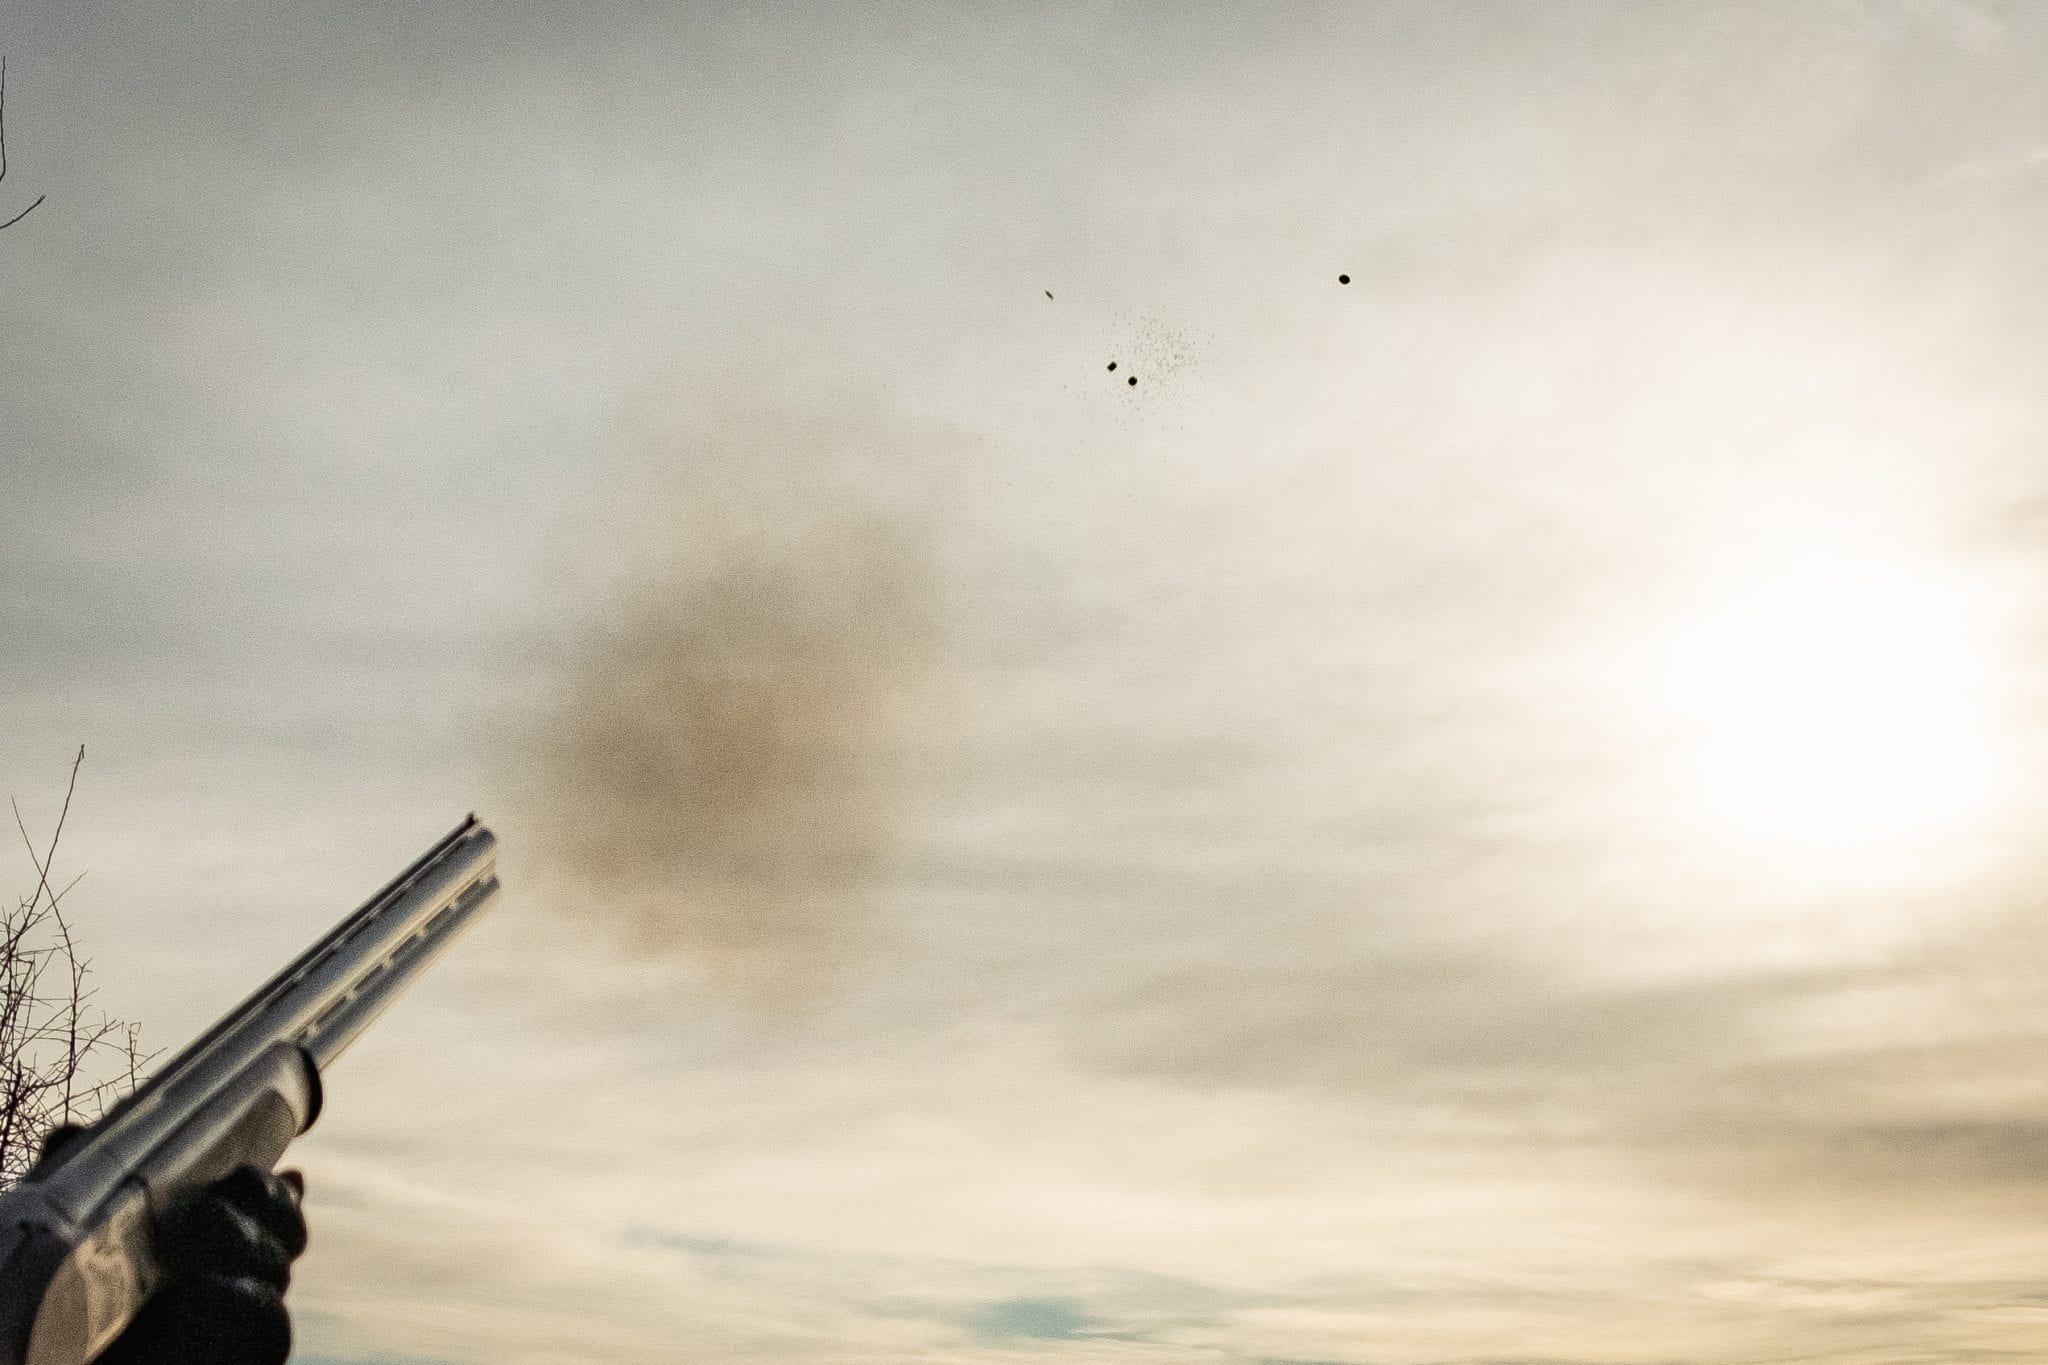 A clay pigeon breaking in midair